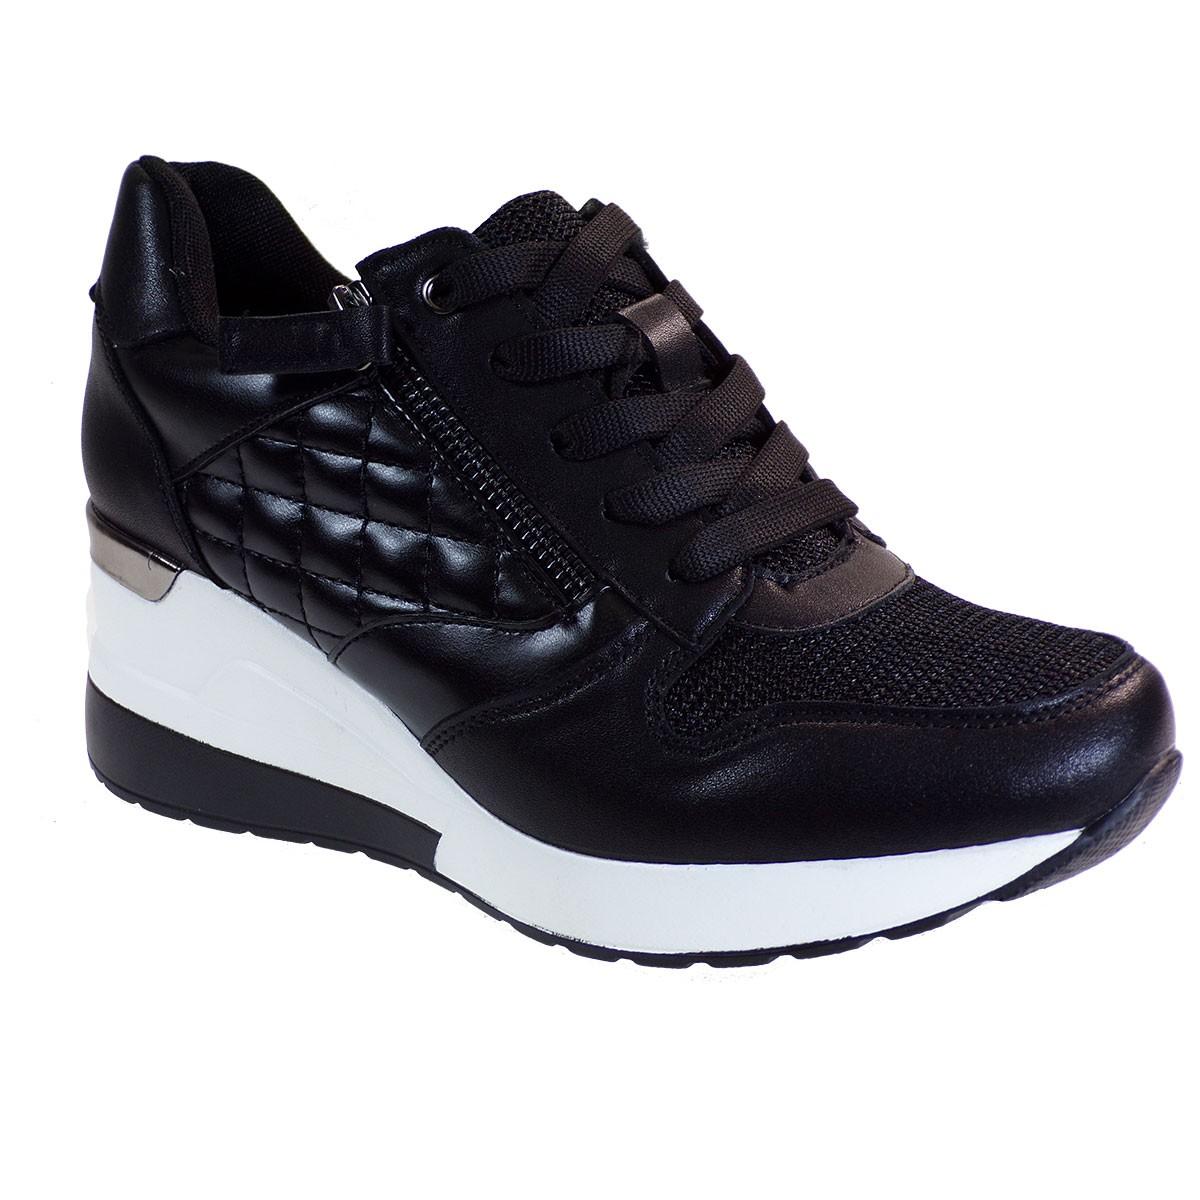 Bagiota Shoes Γυναικεία Παπούτσια Sneakers Αθλητικά H8991 Μαύρο